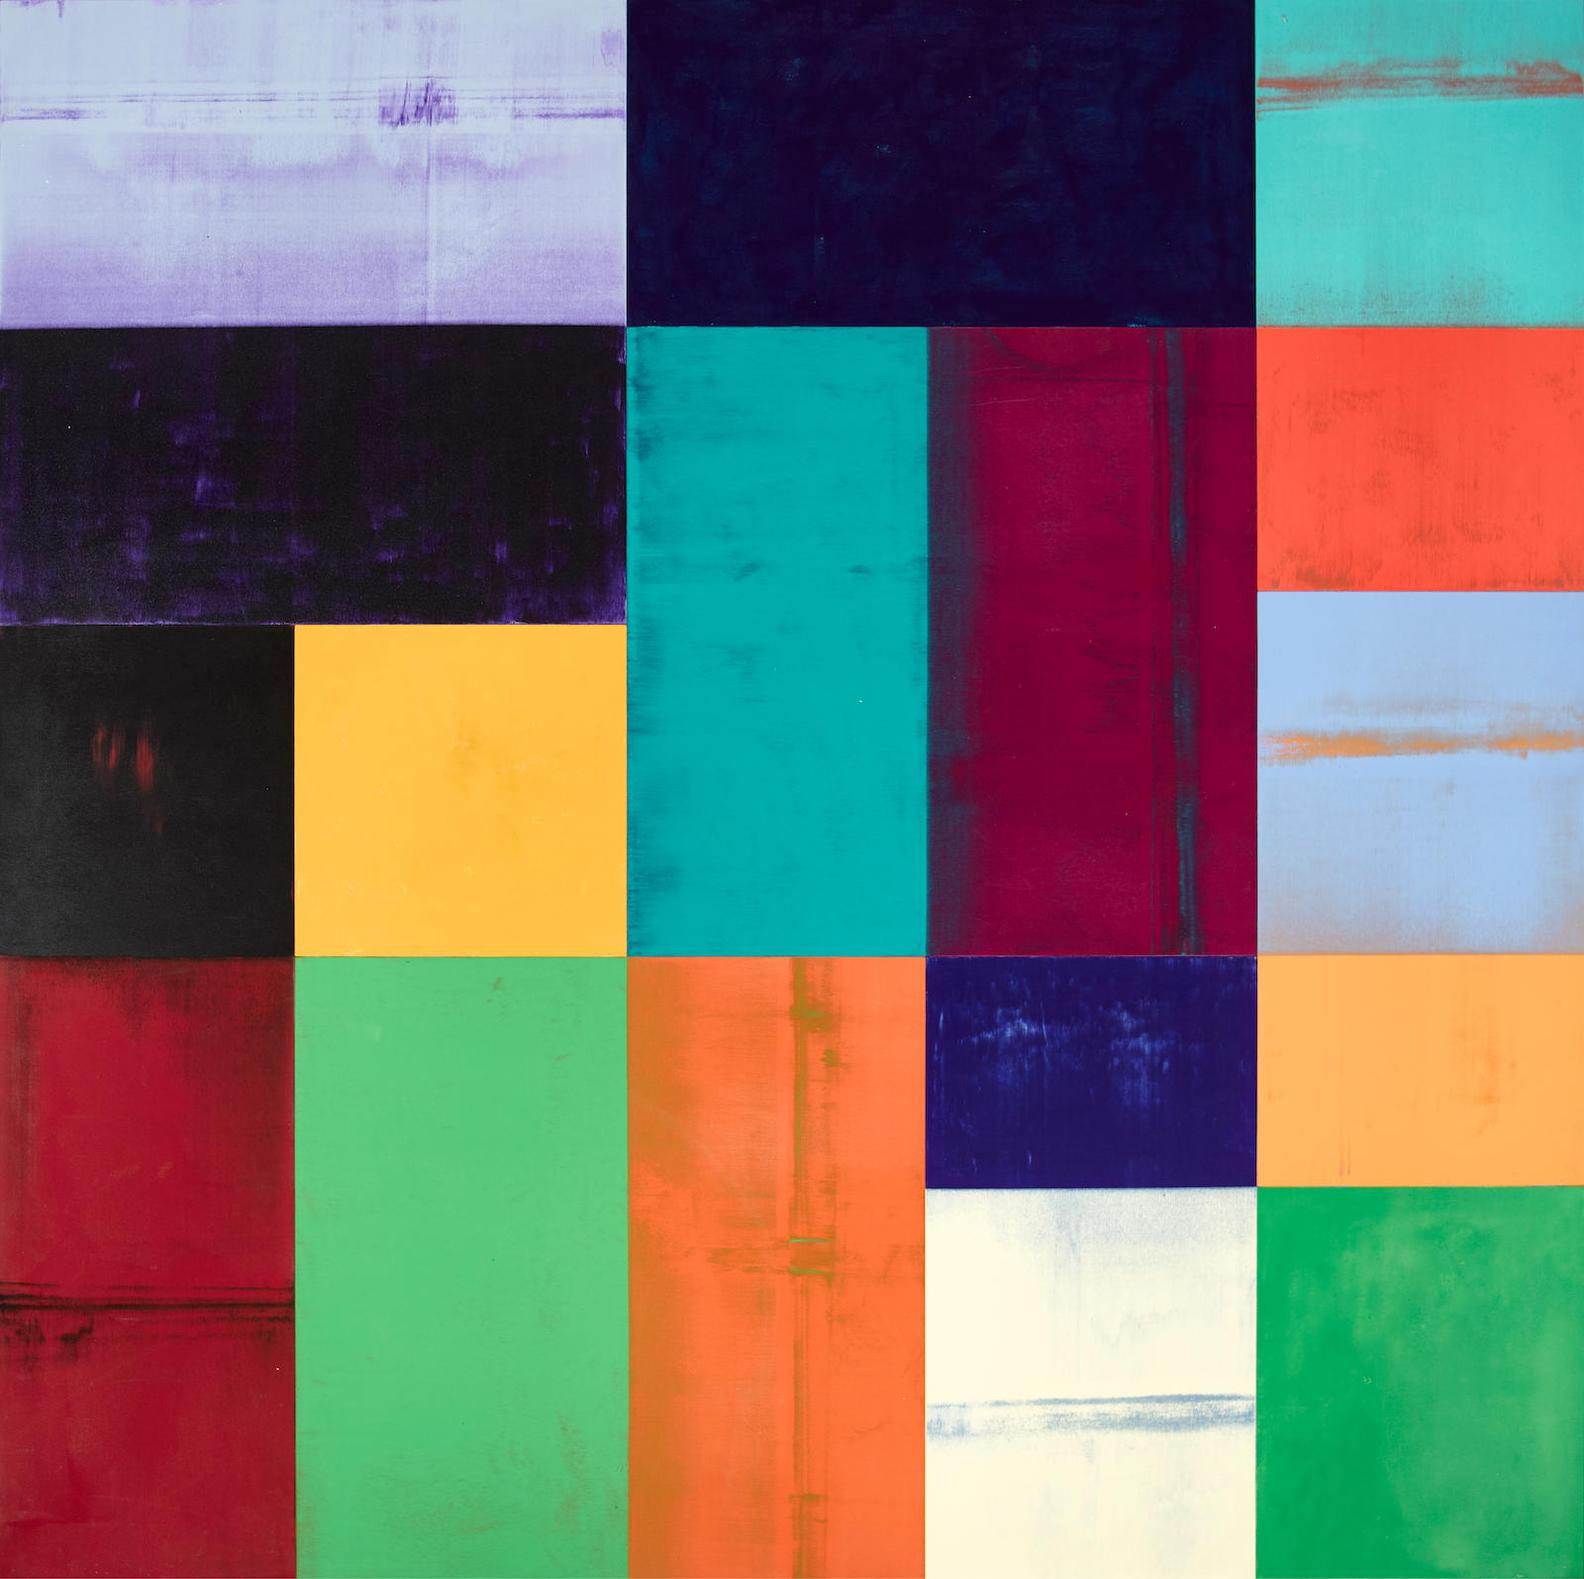 Charles Arnoldi-Megabyte-2005